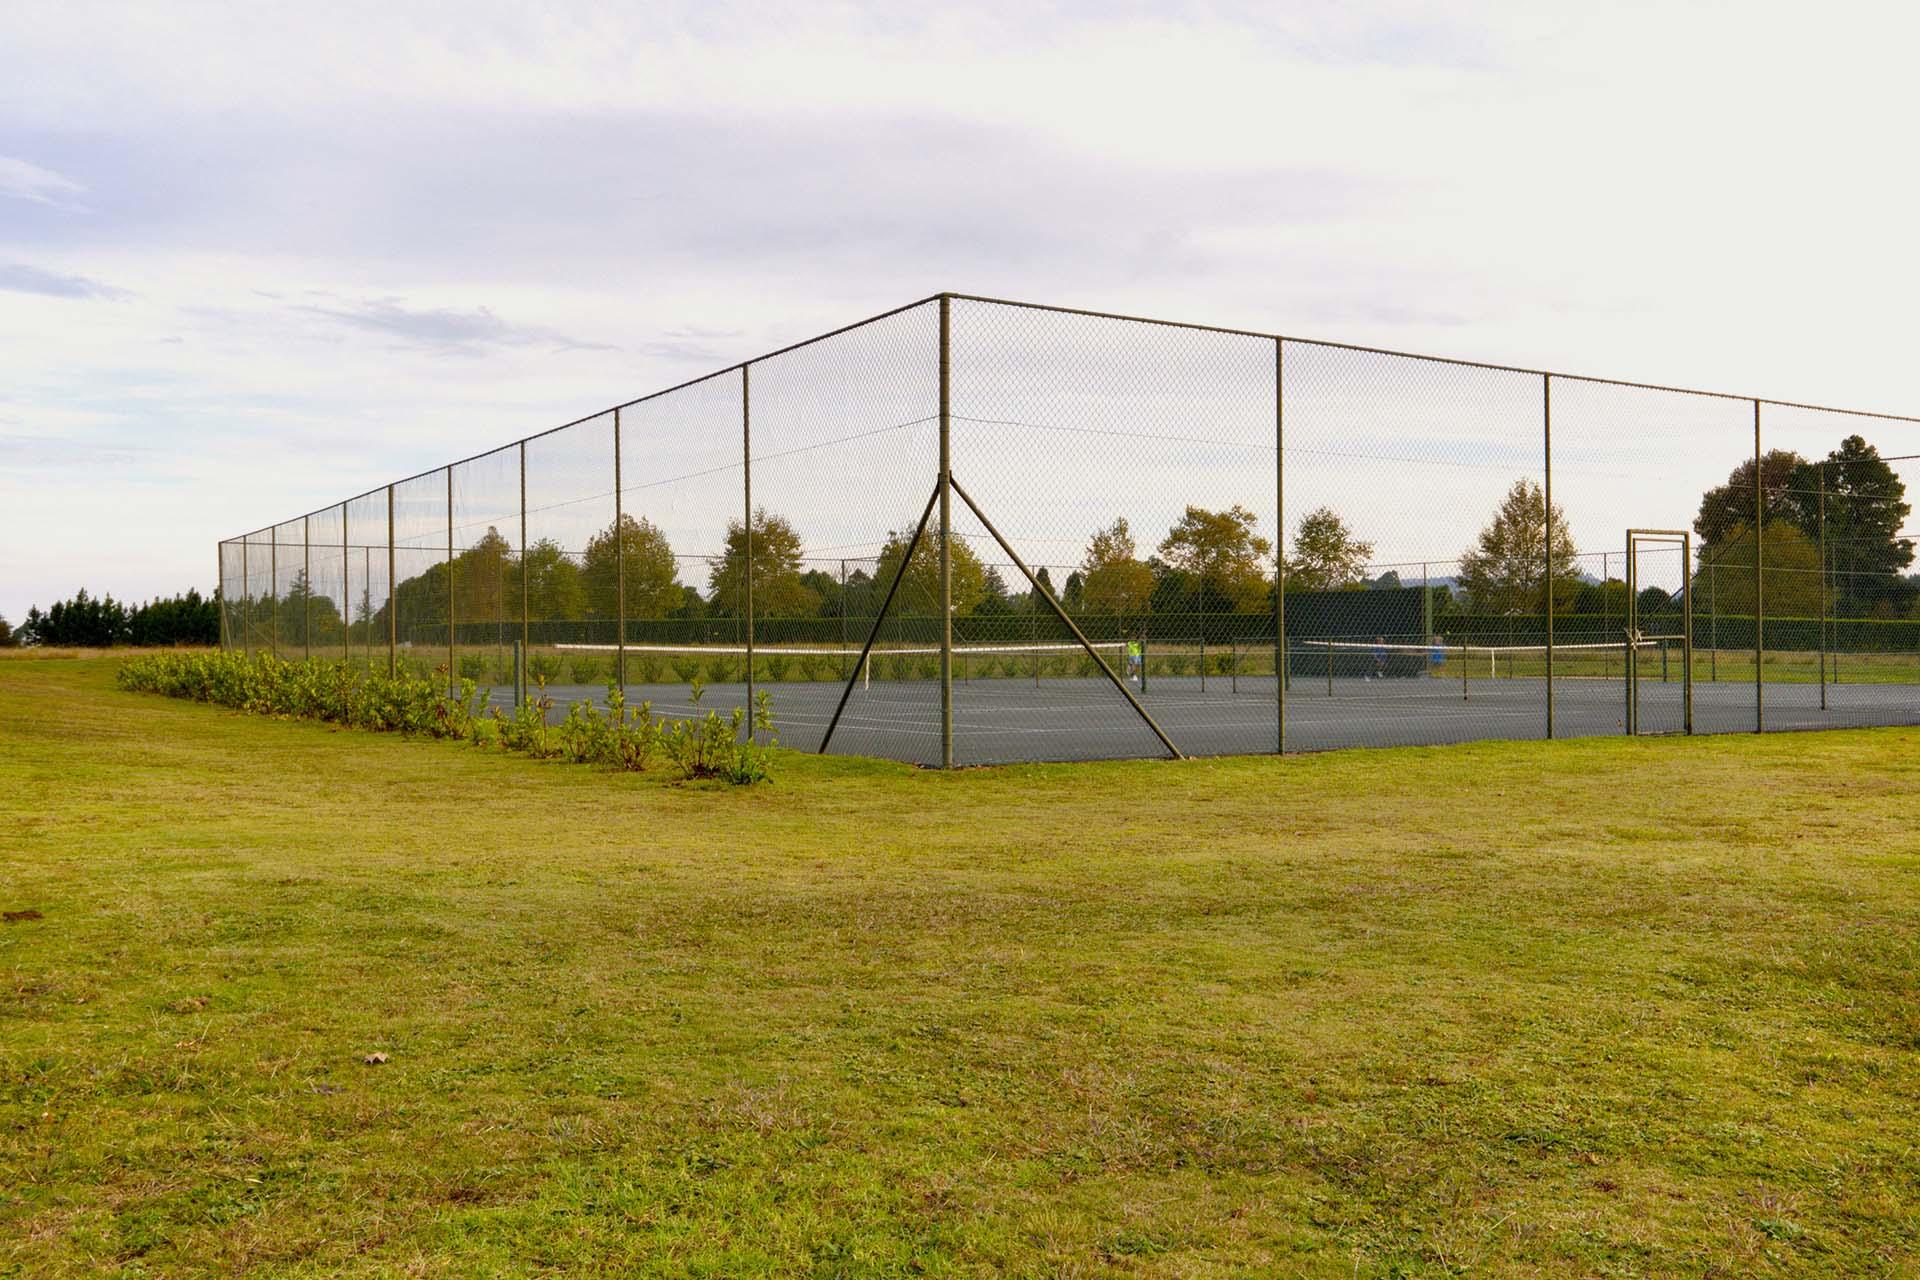 tennis-courts-amenities-garlington-estate-luxury-country-development-hilton-midlands-countryside-contemporary-farm-lifestyle